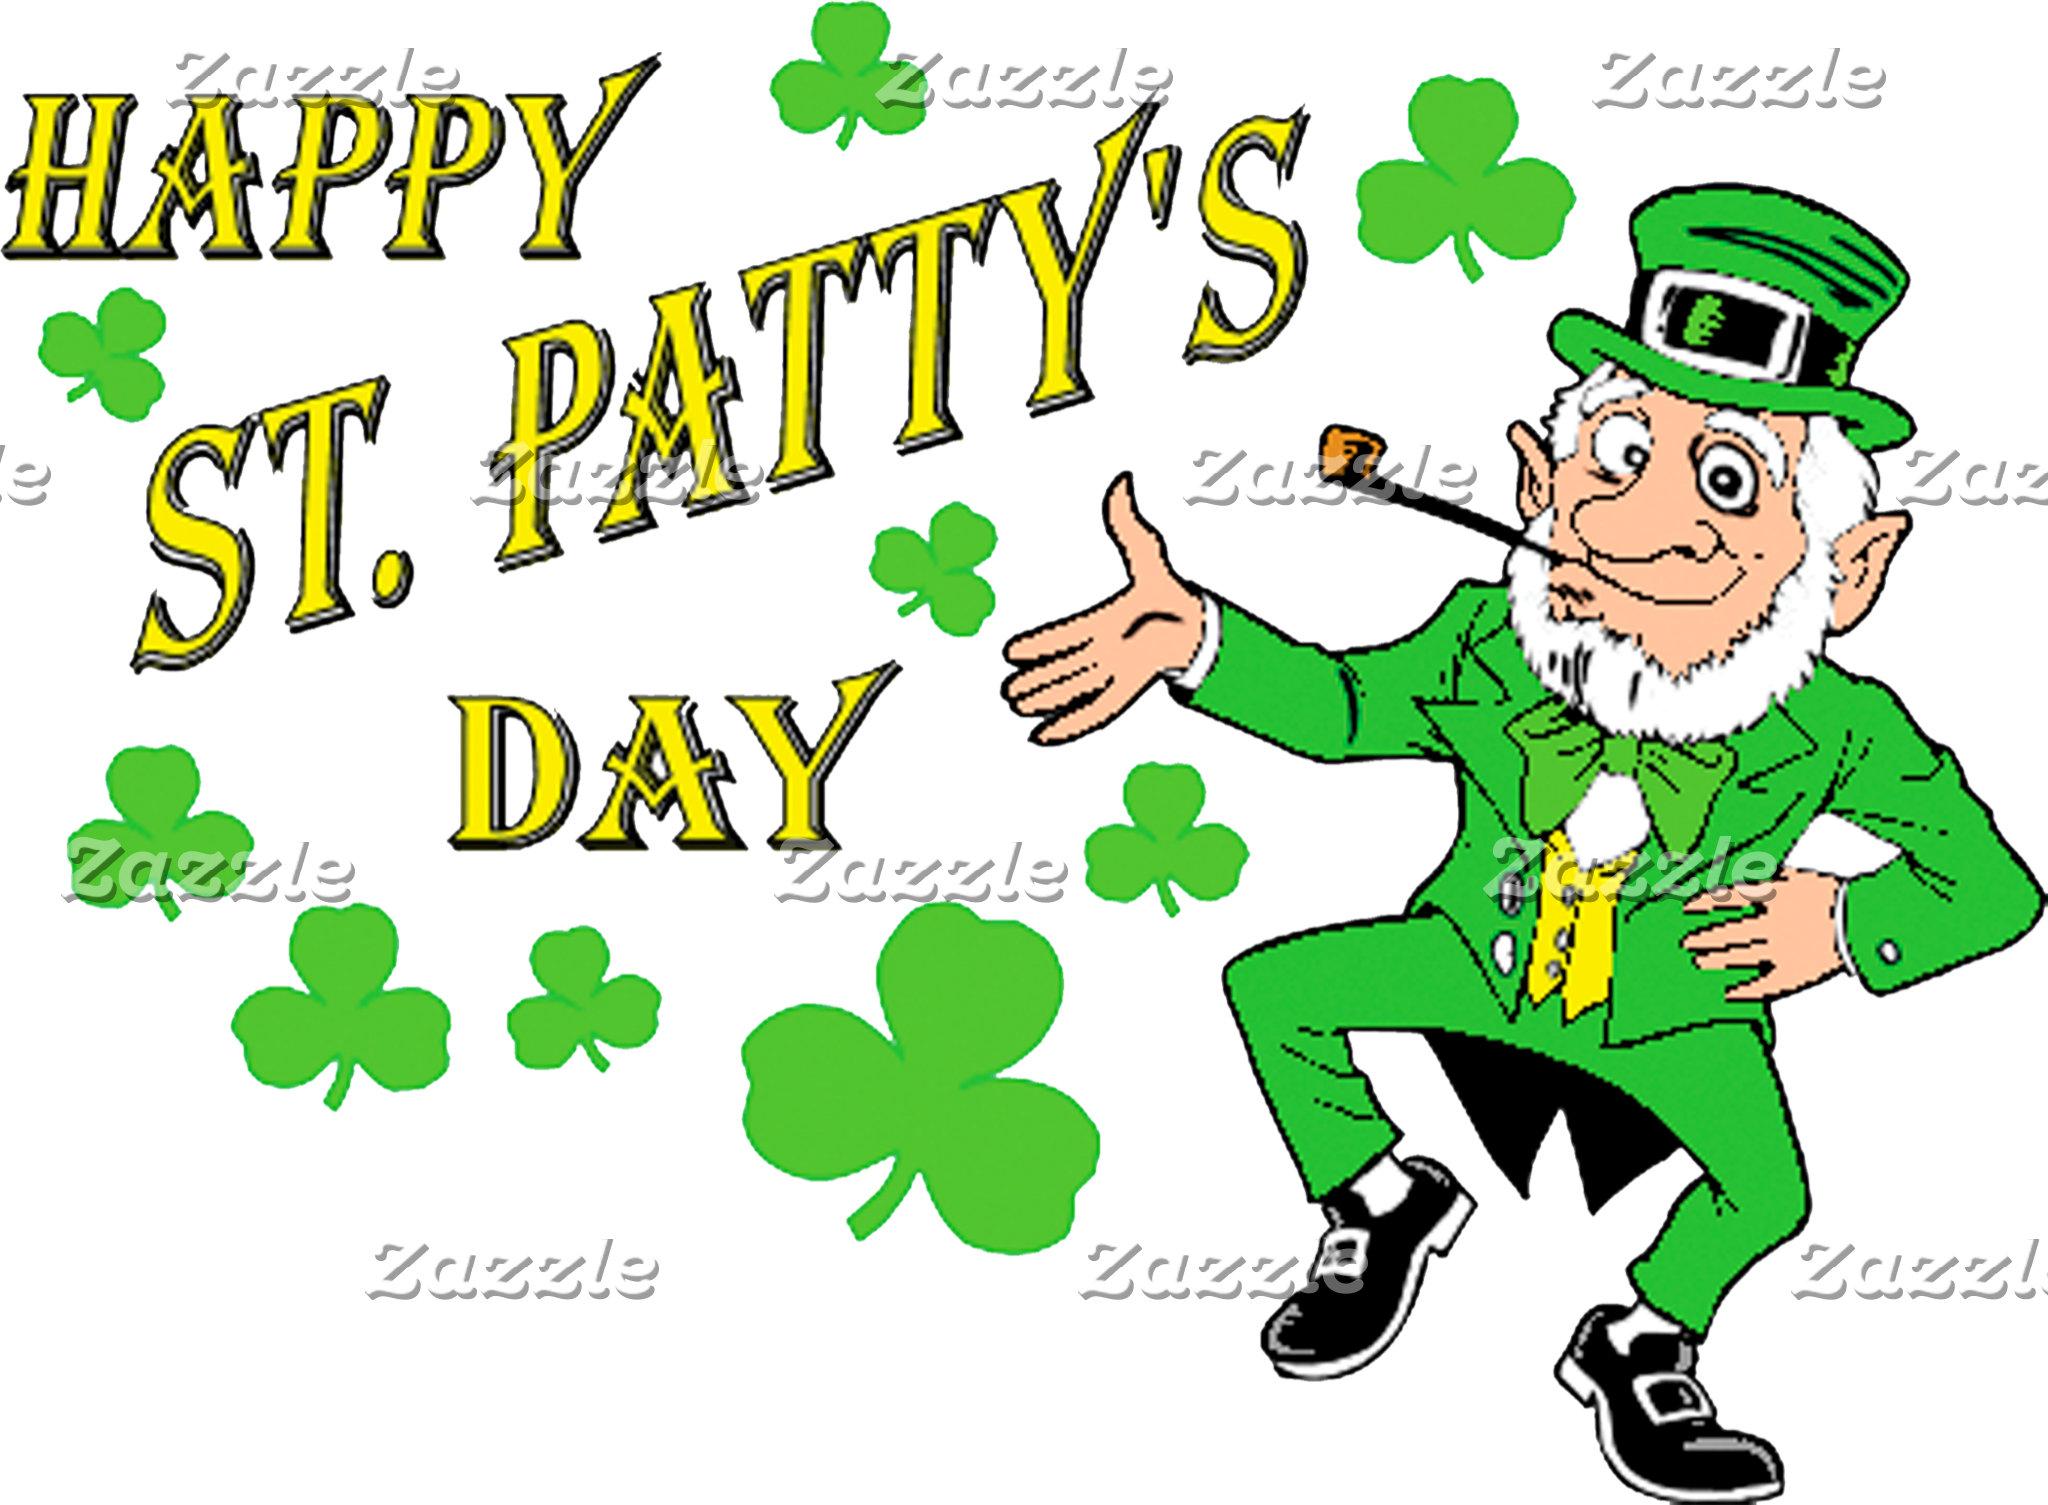 Happy St Patty's Day T-Shirts